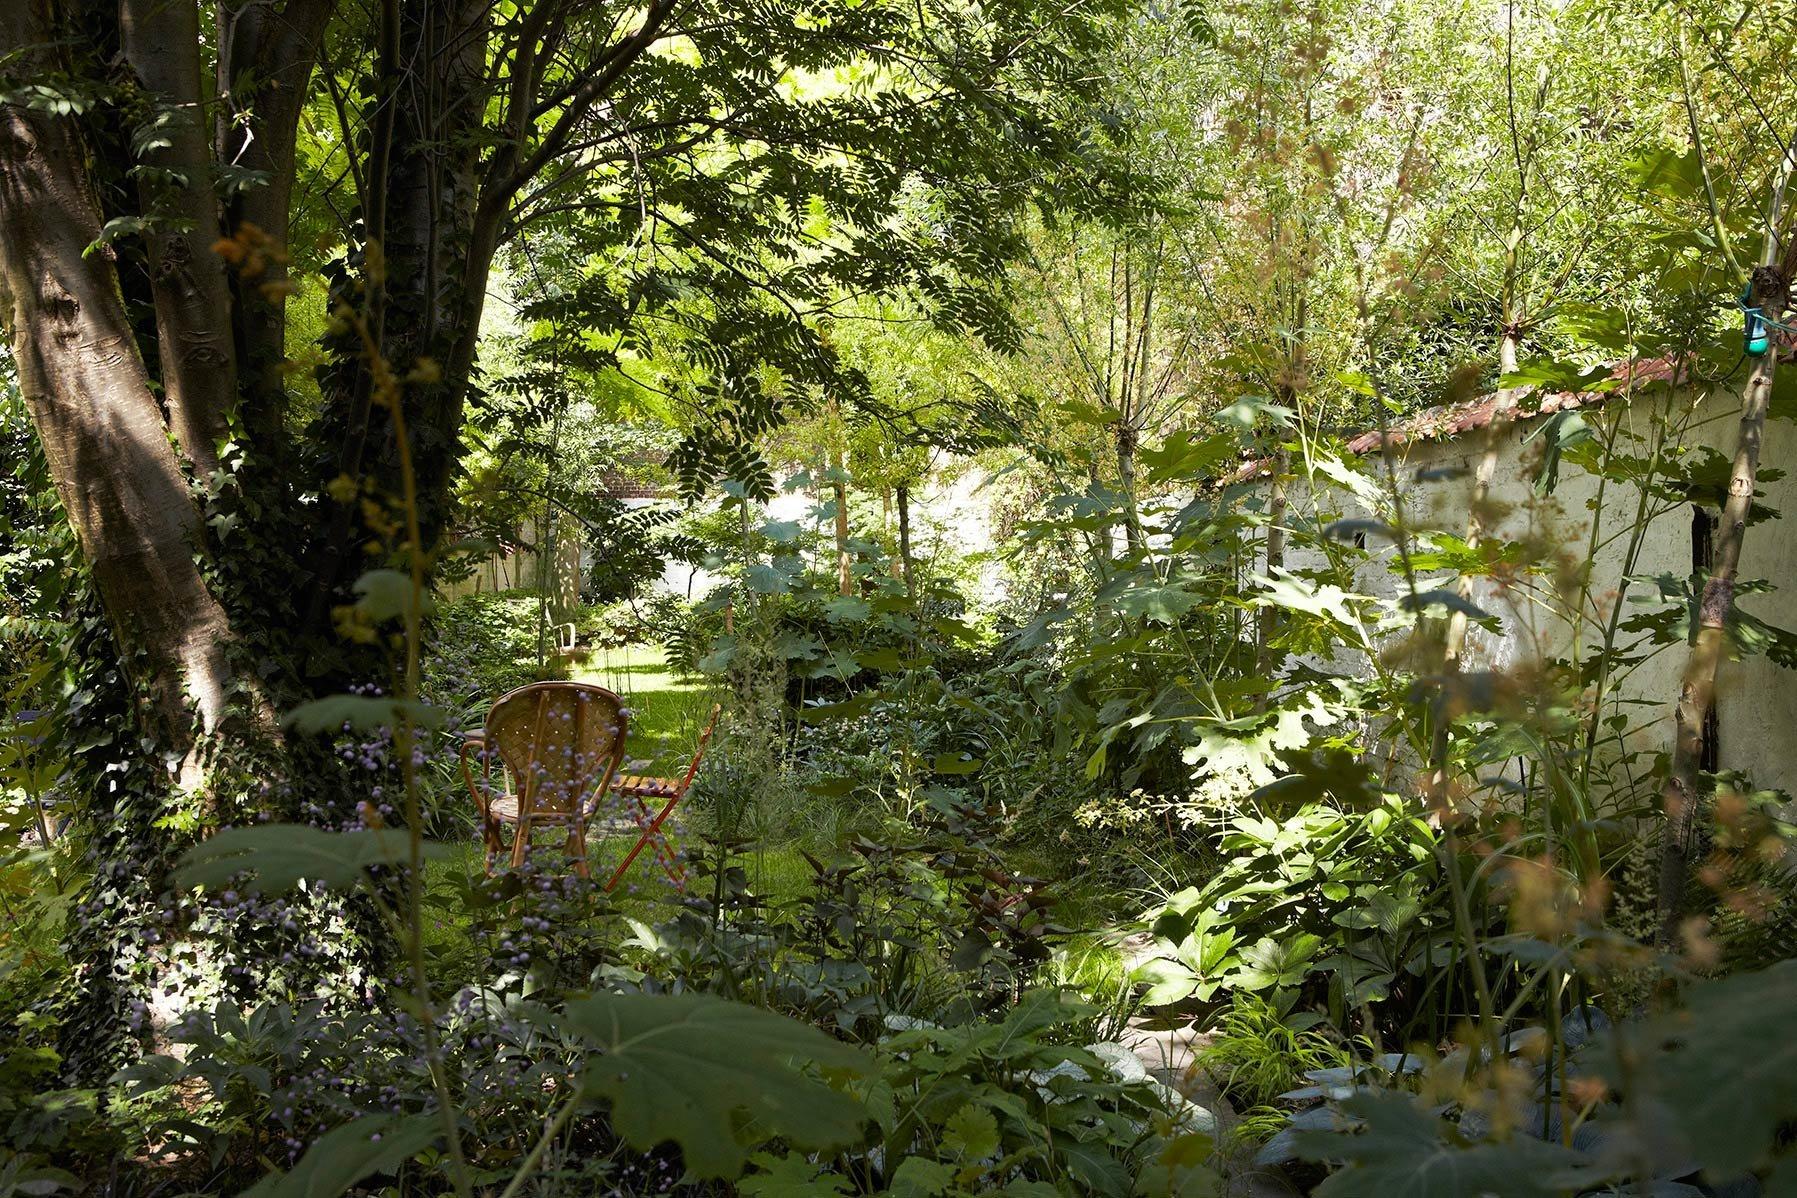 jardin-brunet_MG_0204.jpg